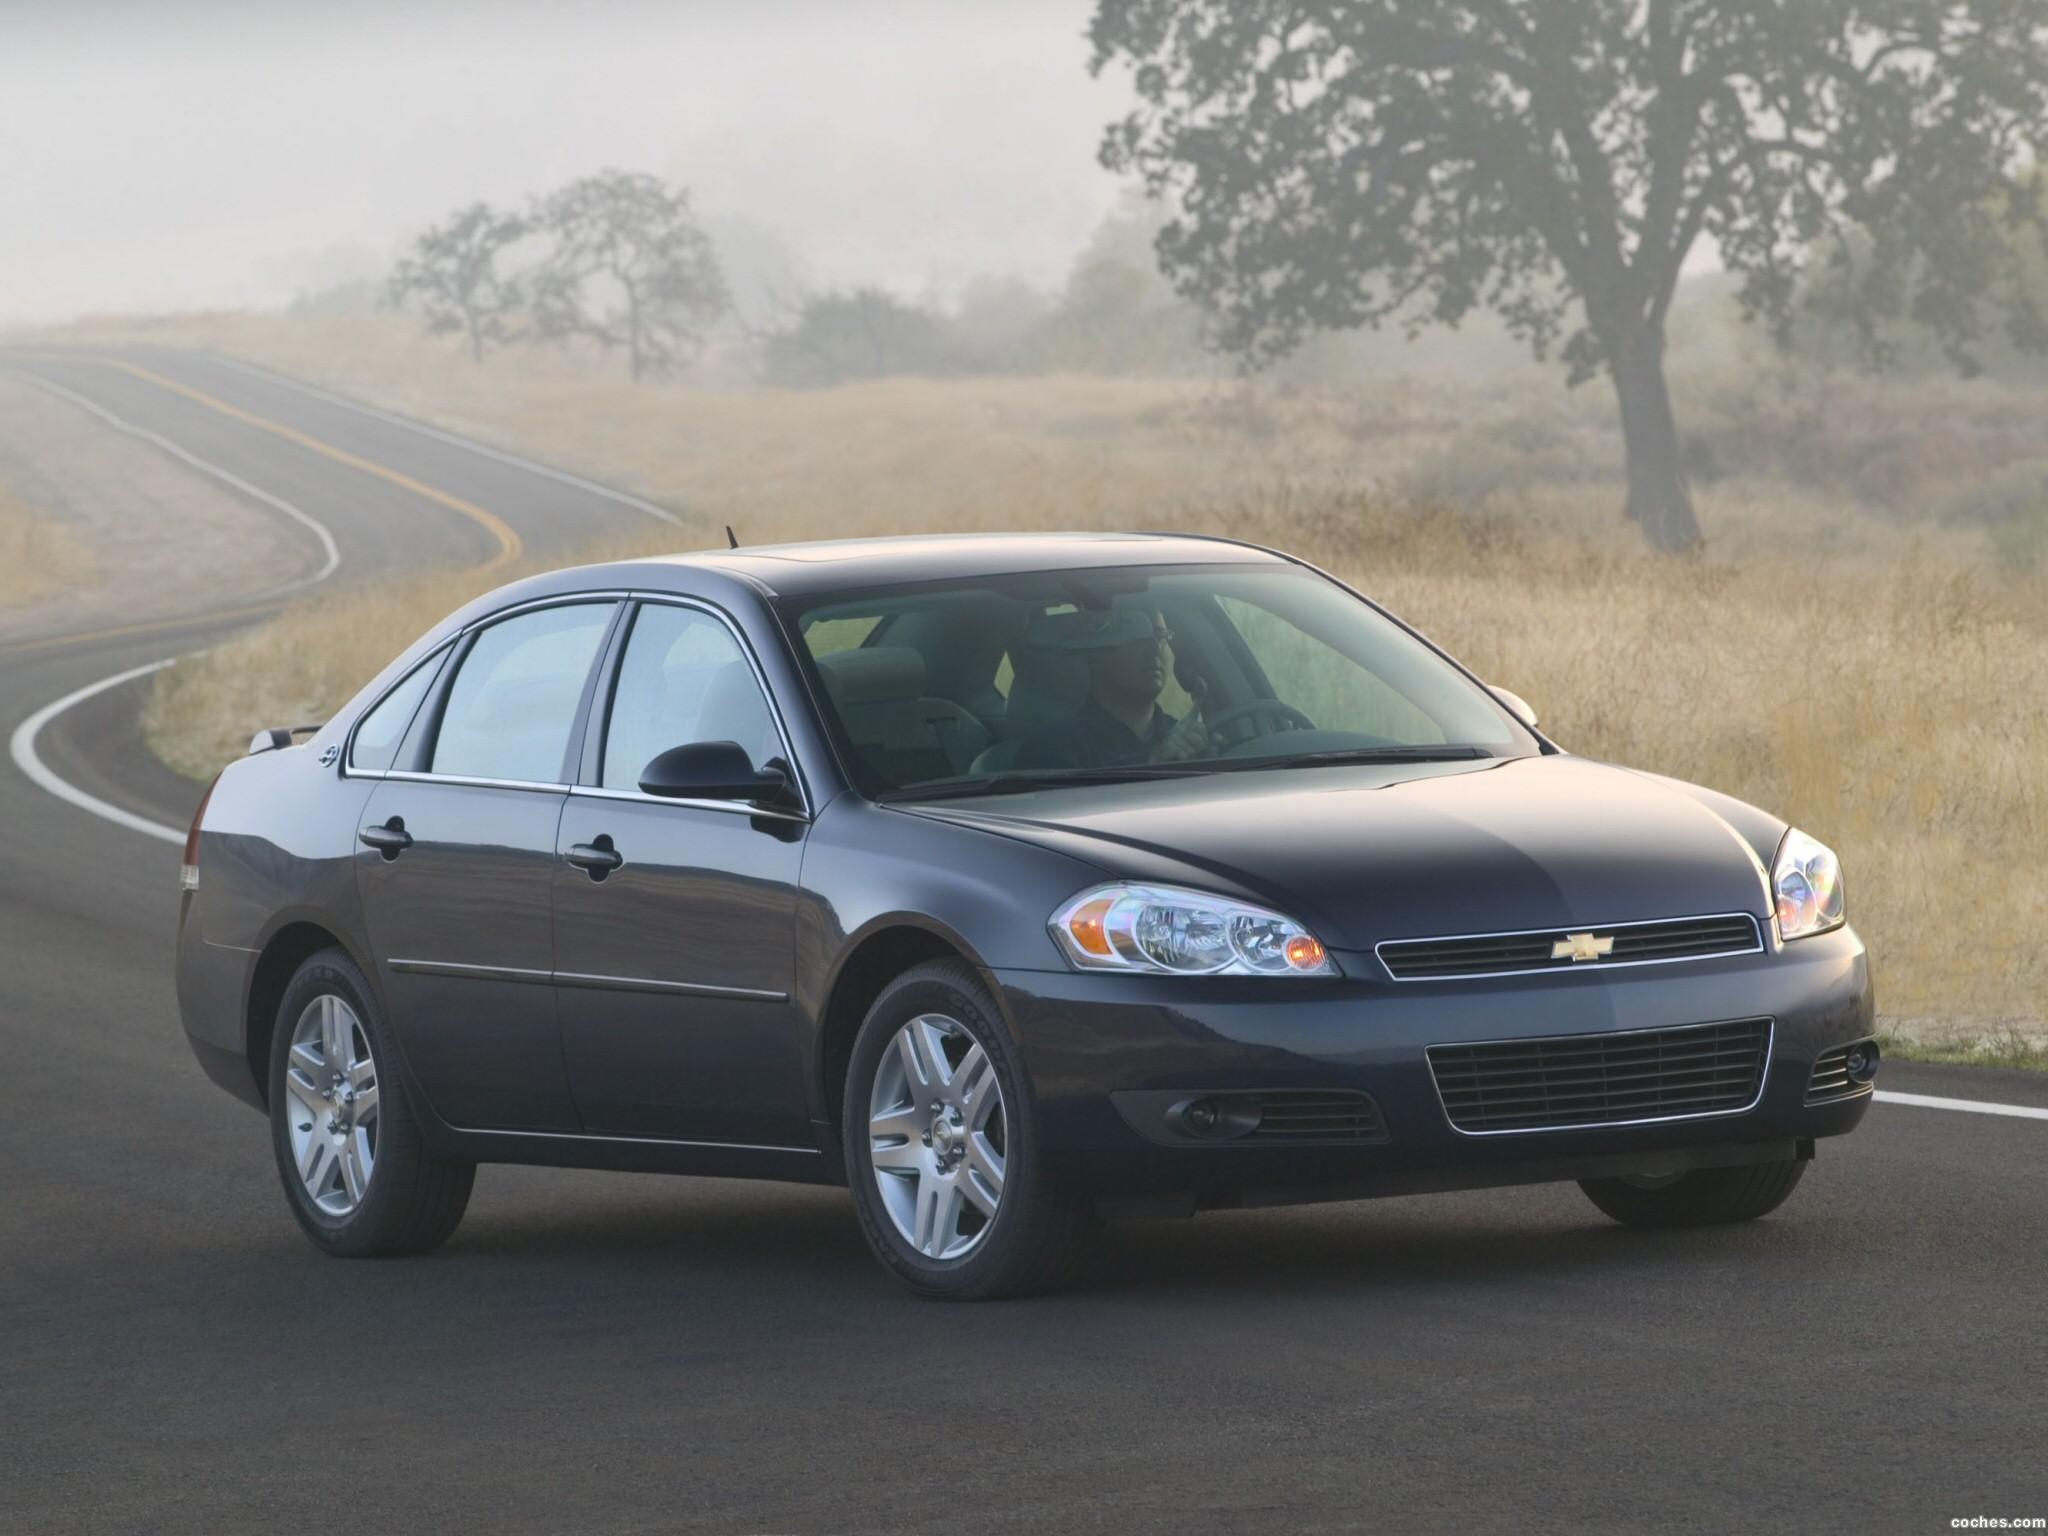 Foto 0 de Chevrolet Impala 2006